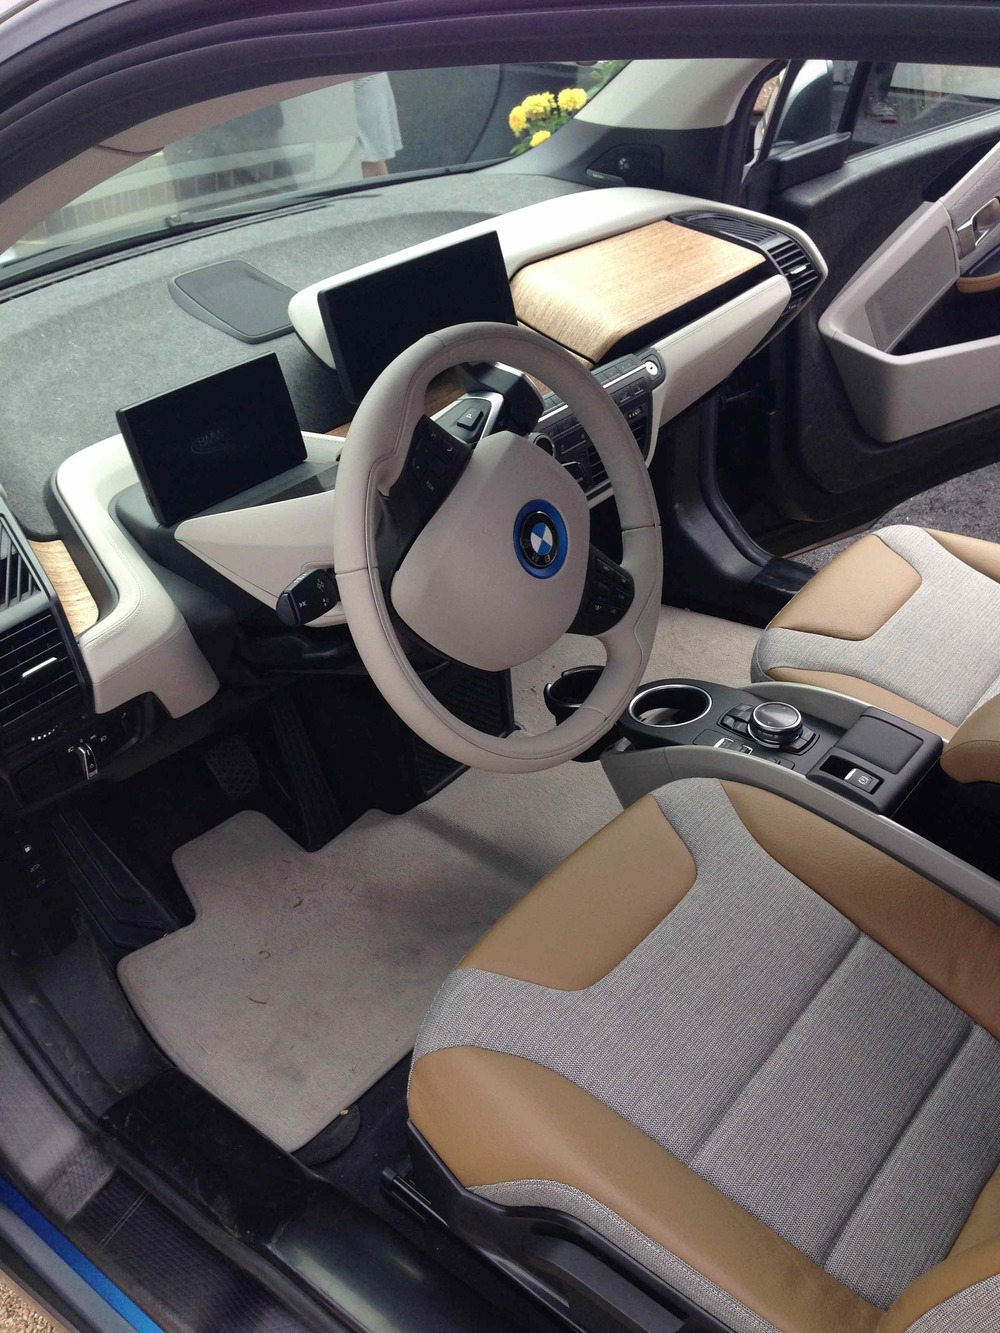 BMW i3 (Photo: The Car Crush)